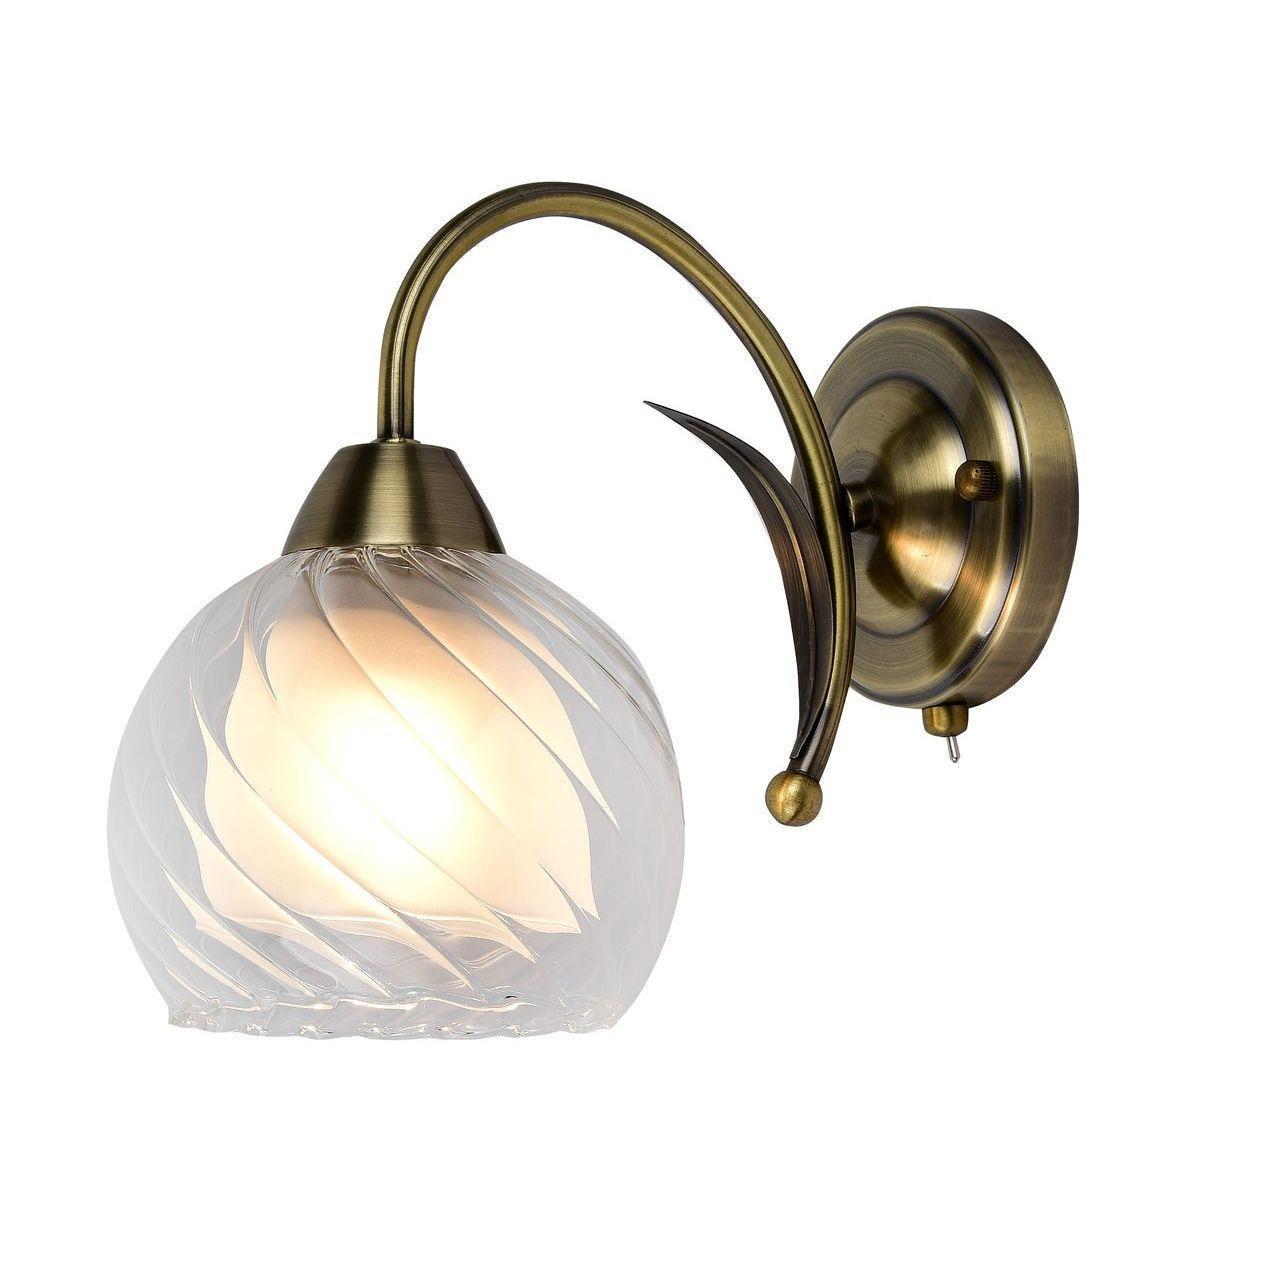 Бра Arte Lamp A1607AP-1AB, E27, 60 Вт arte lamp a9518pl 2ba